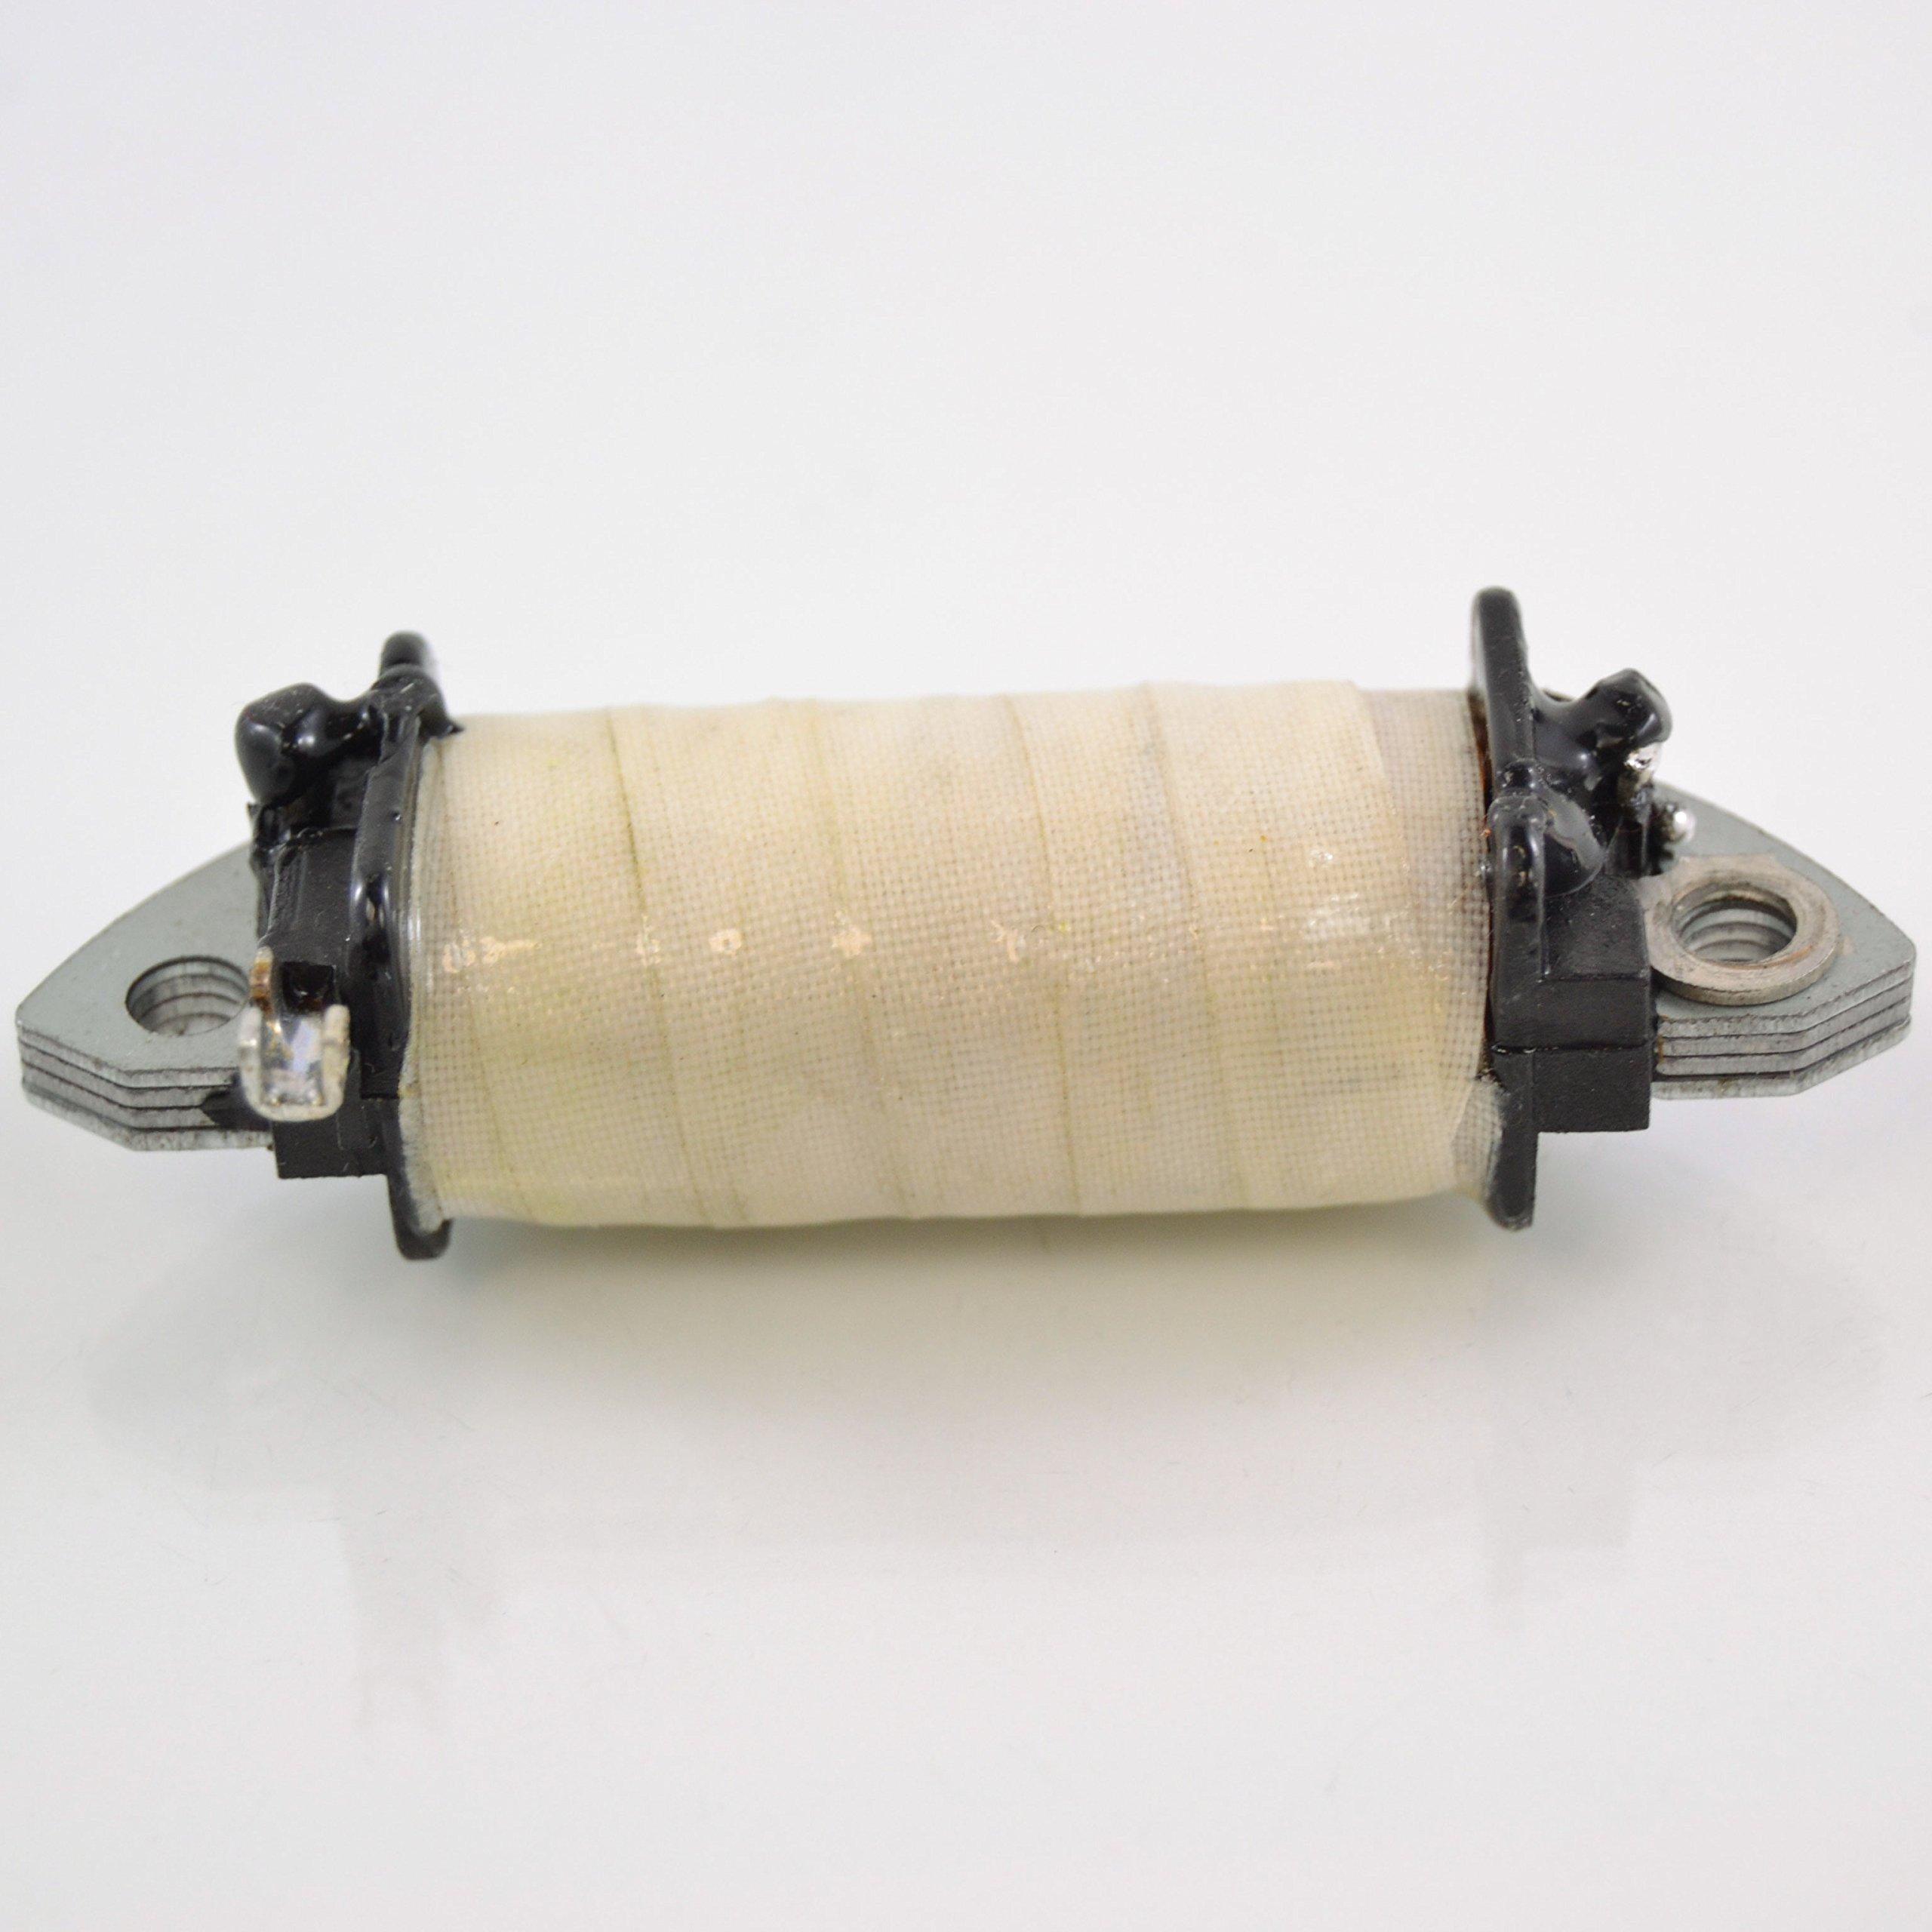 Ignition Source Coil For Honda ATC 185 ATC 200 ATC 250 1980 1981 1982 1983 1984 1985 OEM Repl.# 31120-961-004